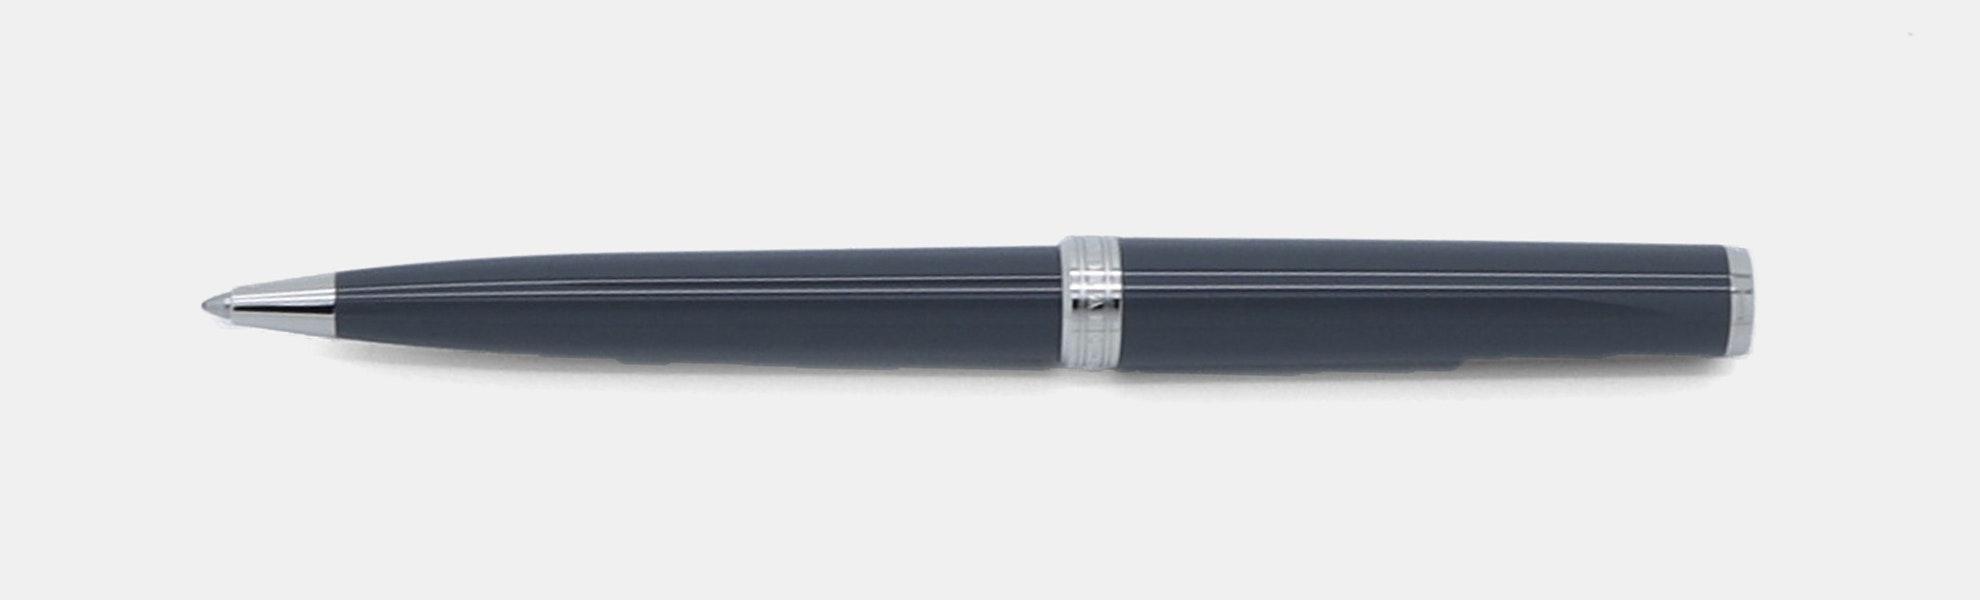 Montblanc PIX Ballpoint Pen